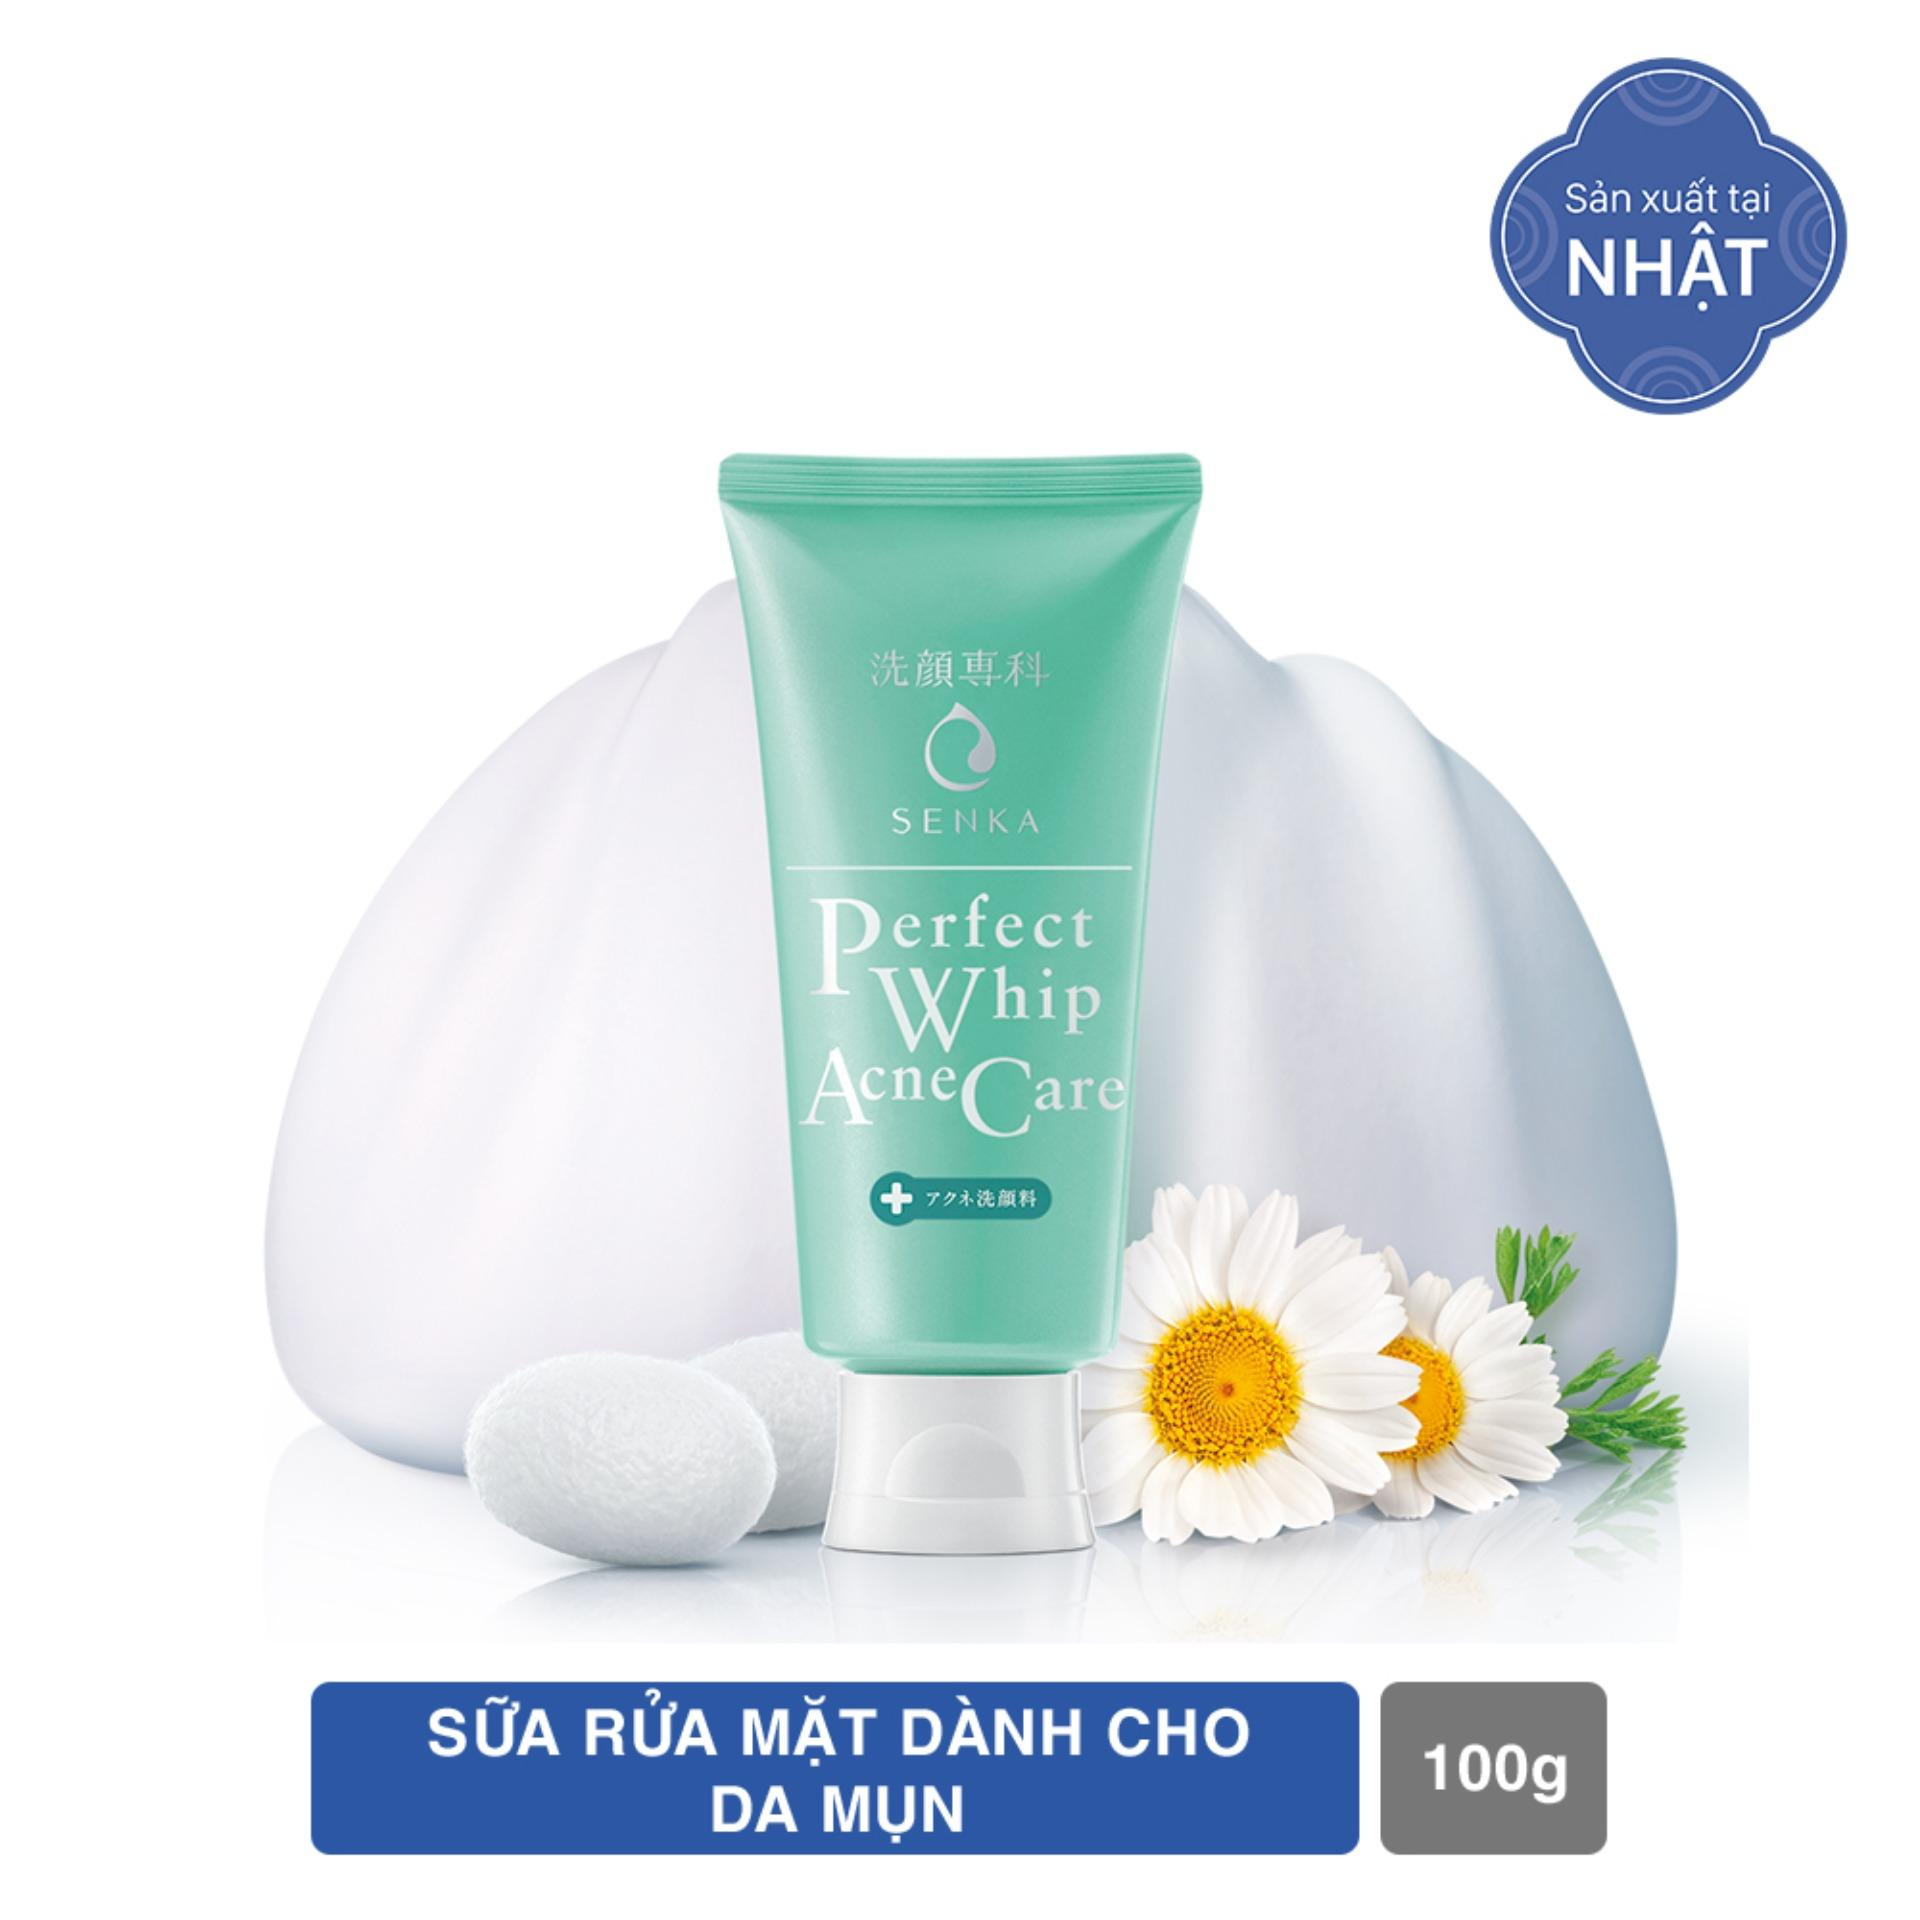 Deal Ưu Đãi Sữa Rửa Mặt Giảm Mụn Senka Perfect Whip Acne Care 100g